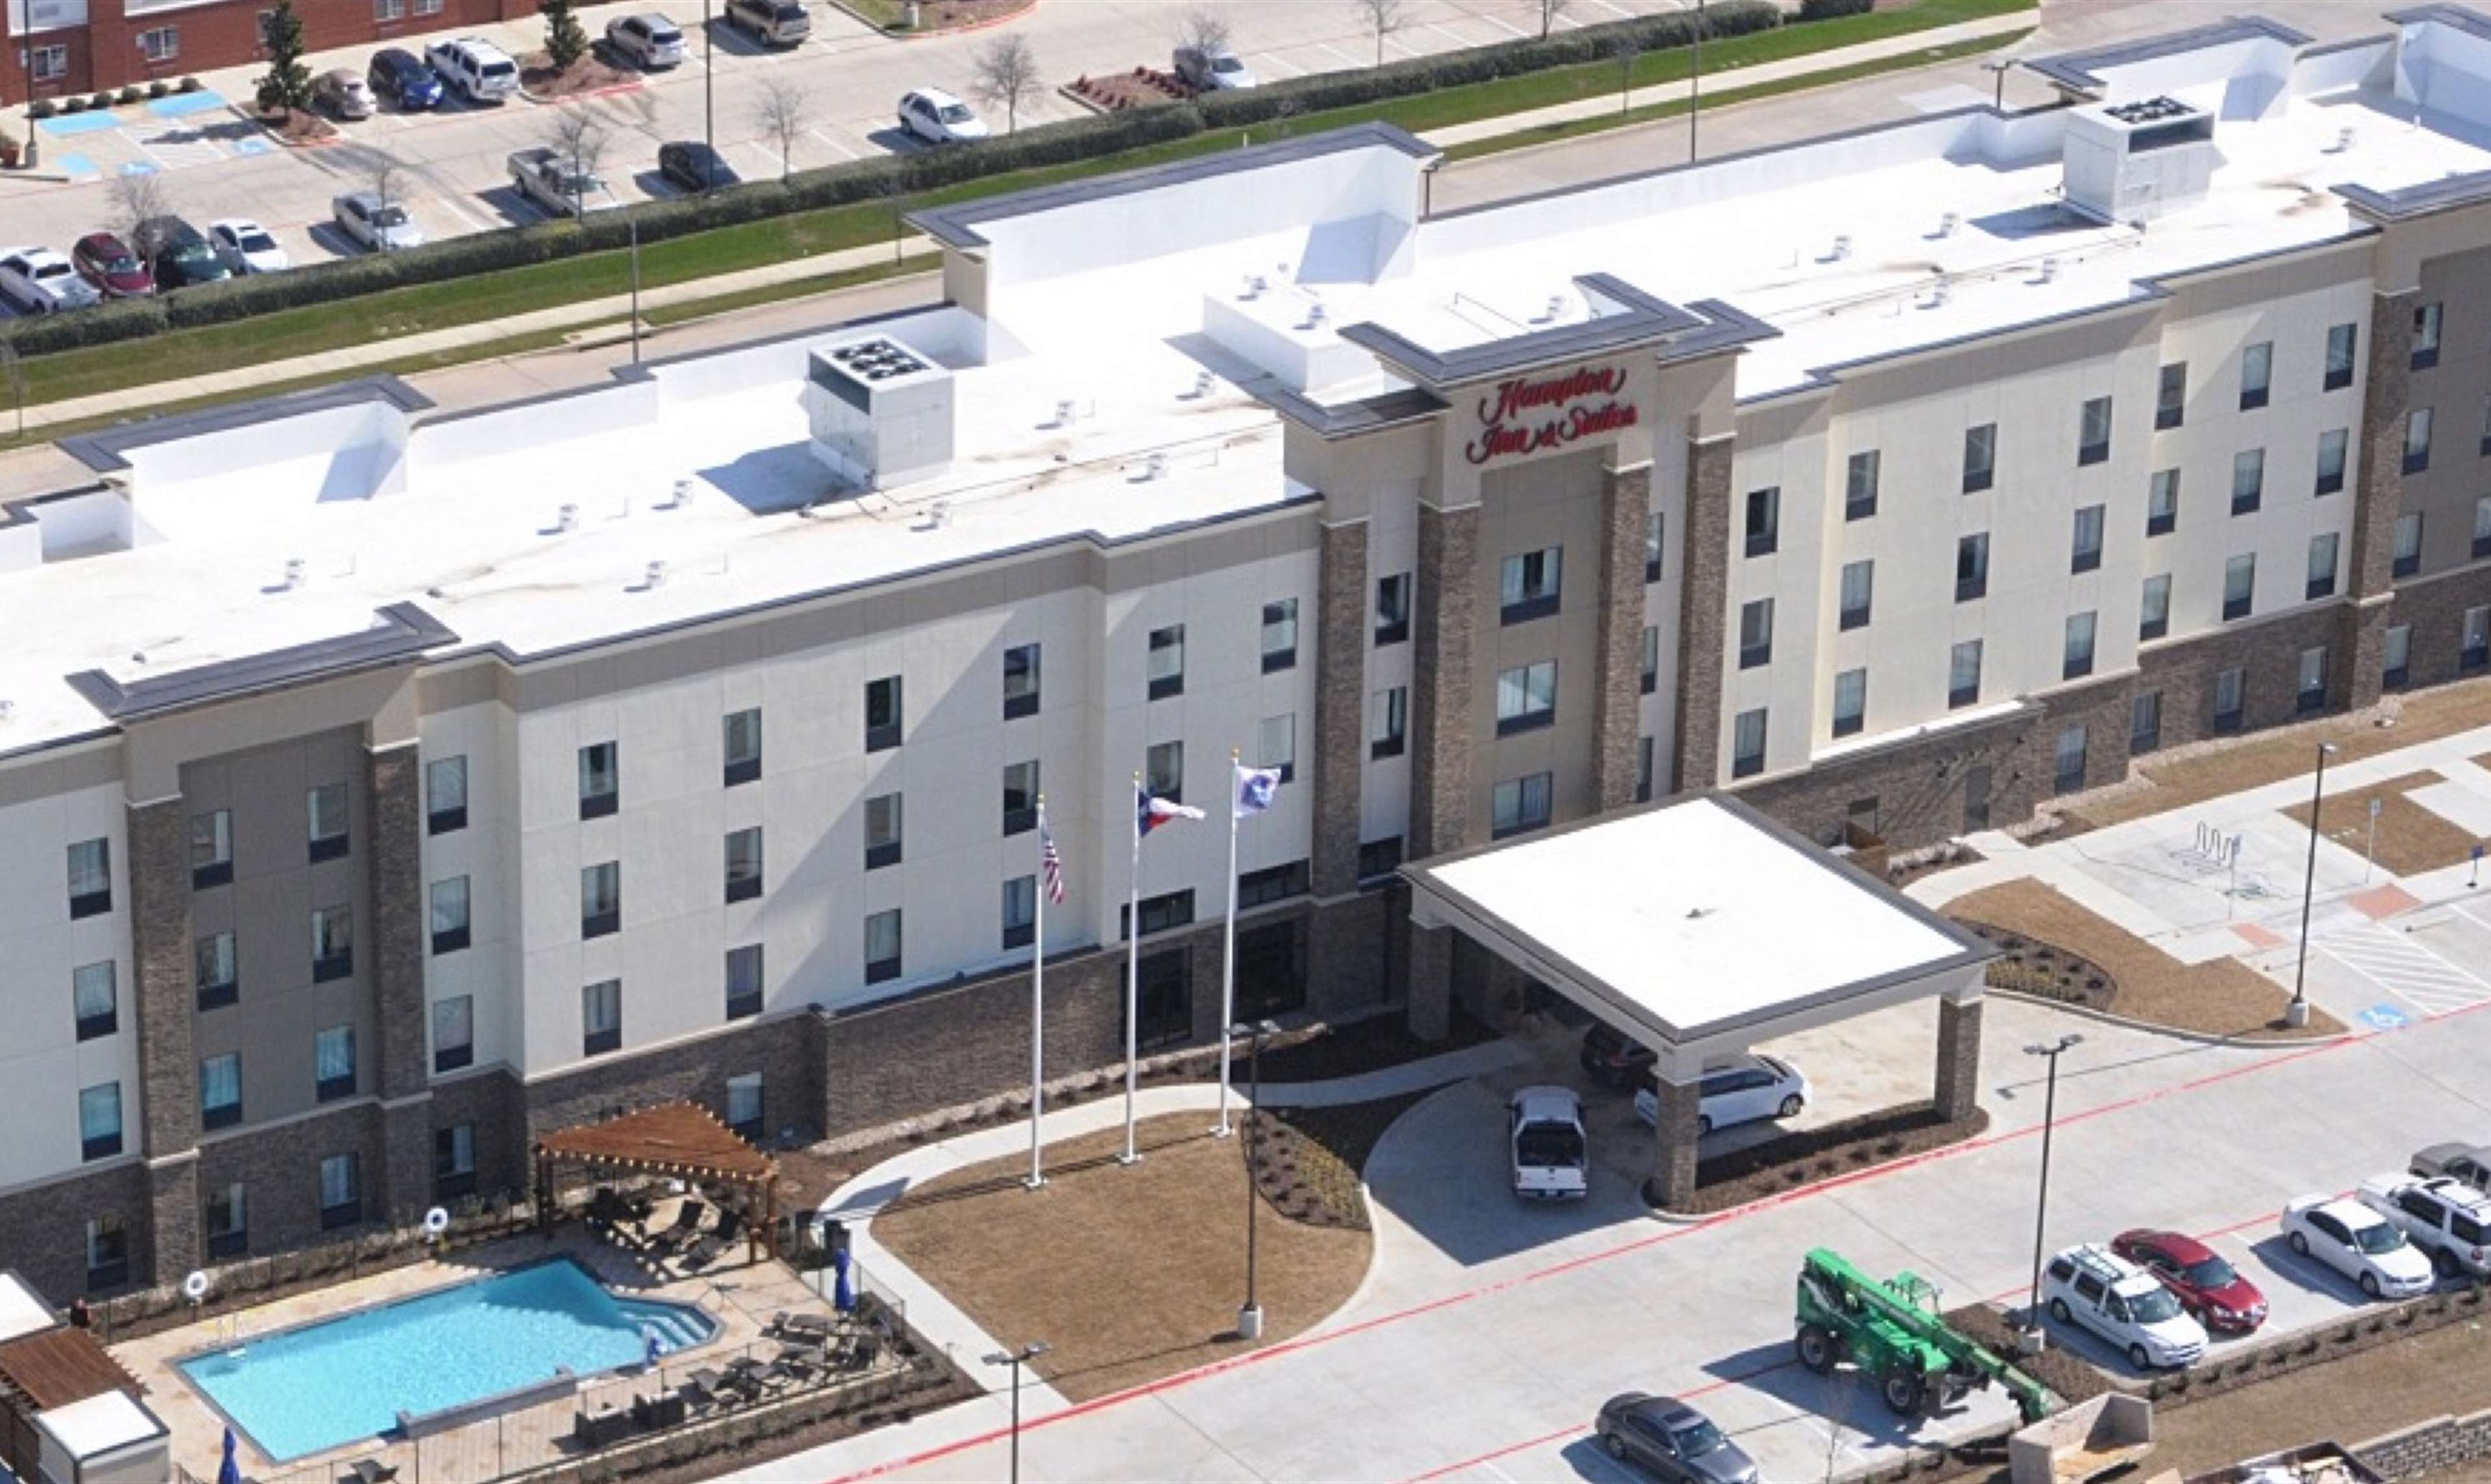 Hampton Inn & Suites Dallas/Ft. Worth Airport South image 0